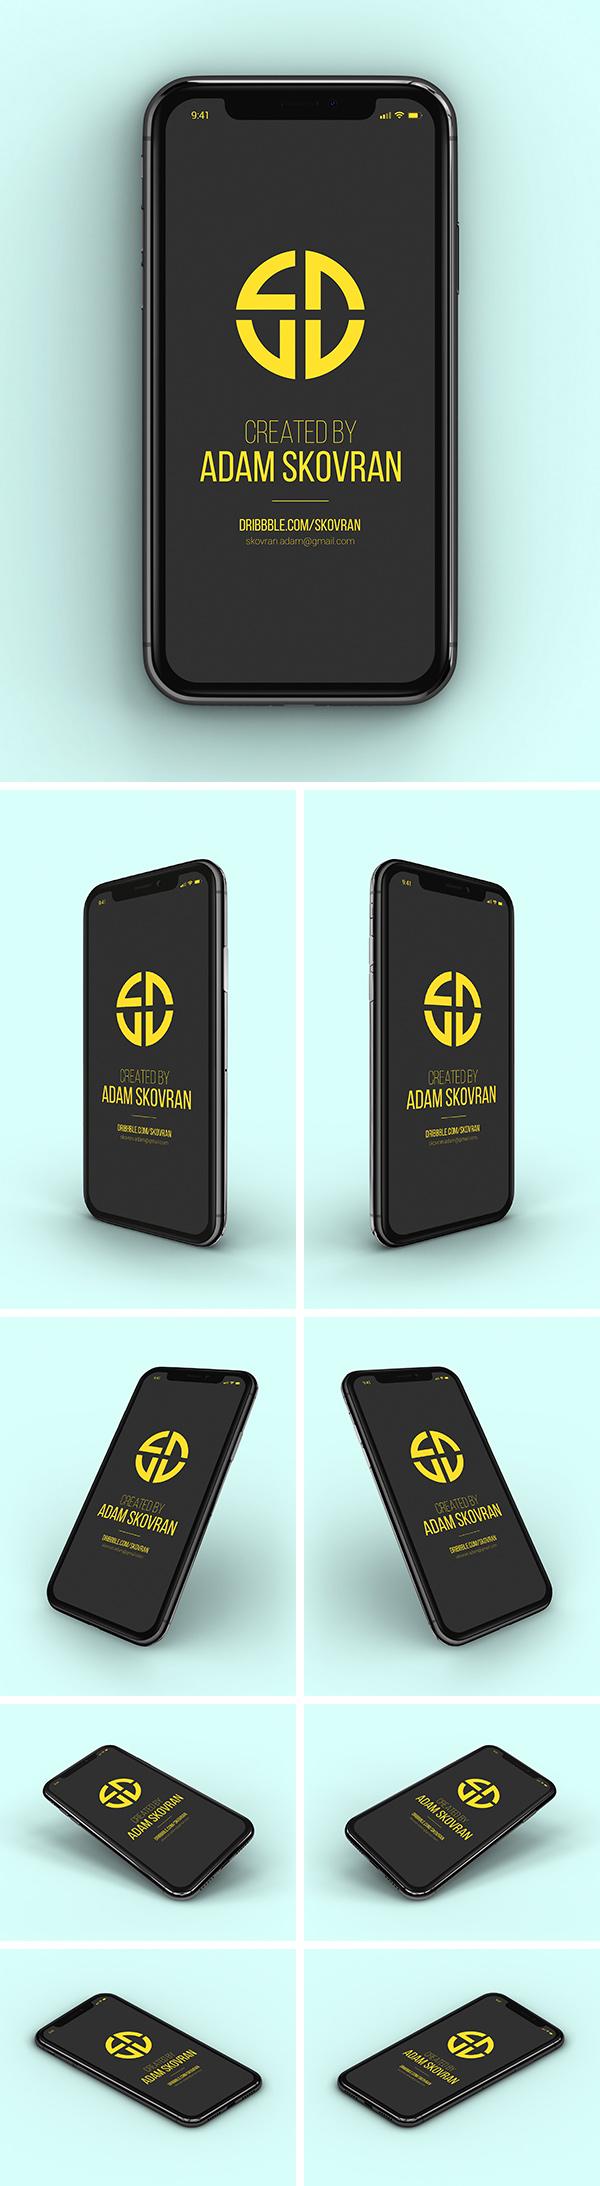 iPhone-X-MockUps-600